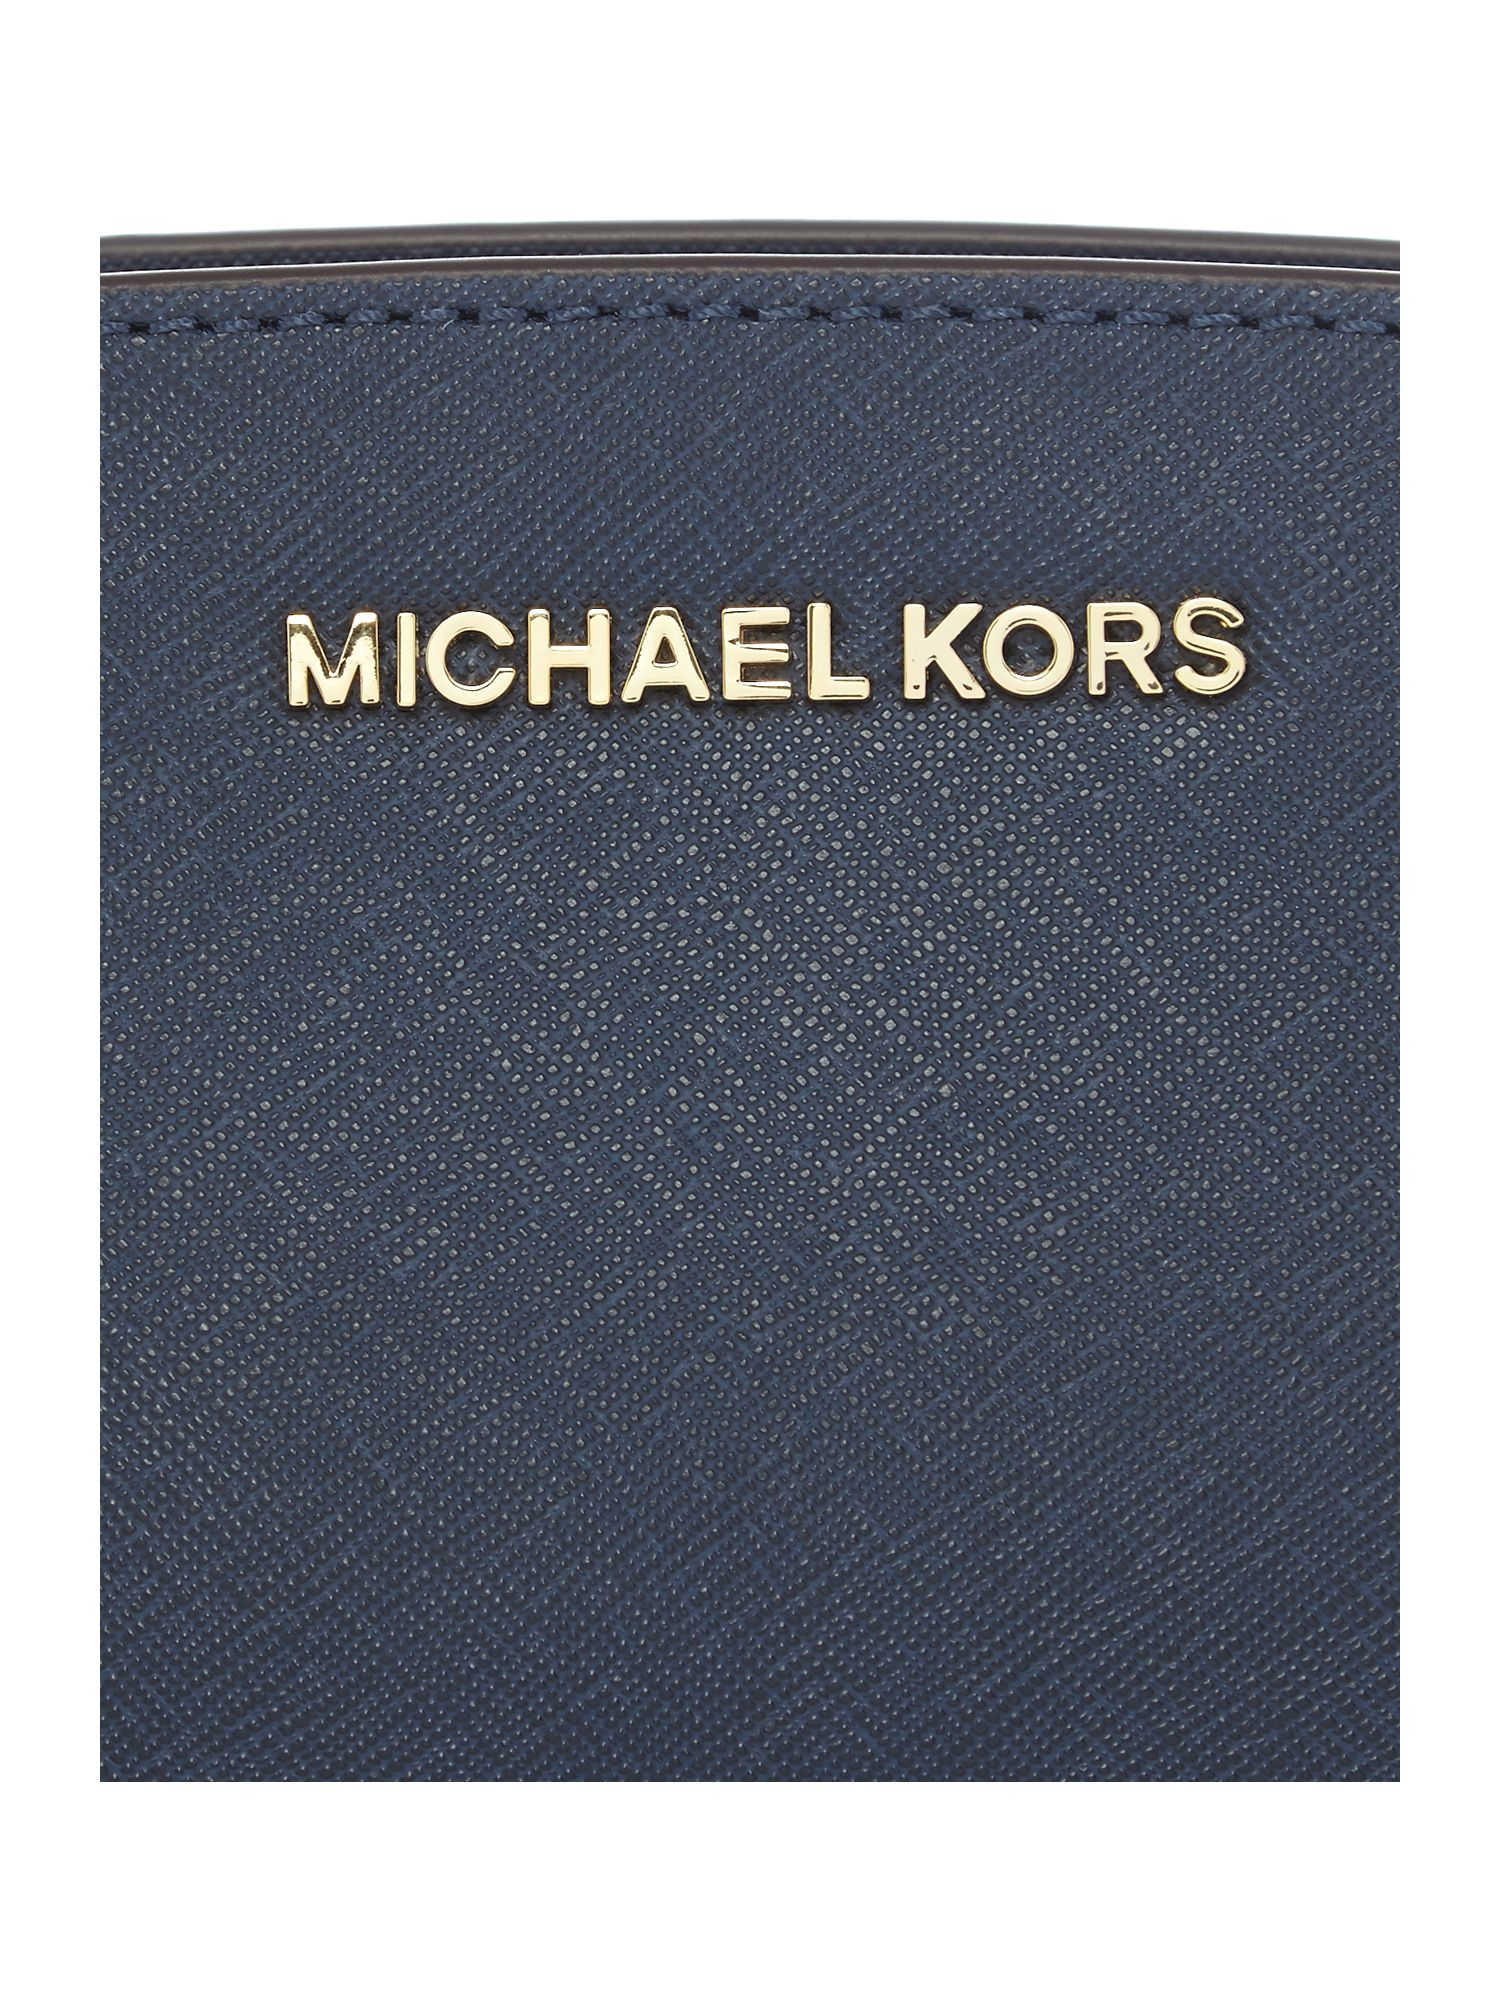 Michael Kors Selma Navy Mini Cross Body Bag in Blue